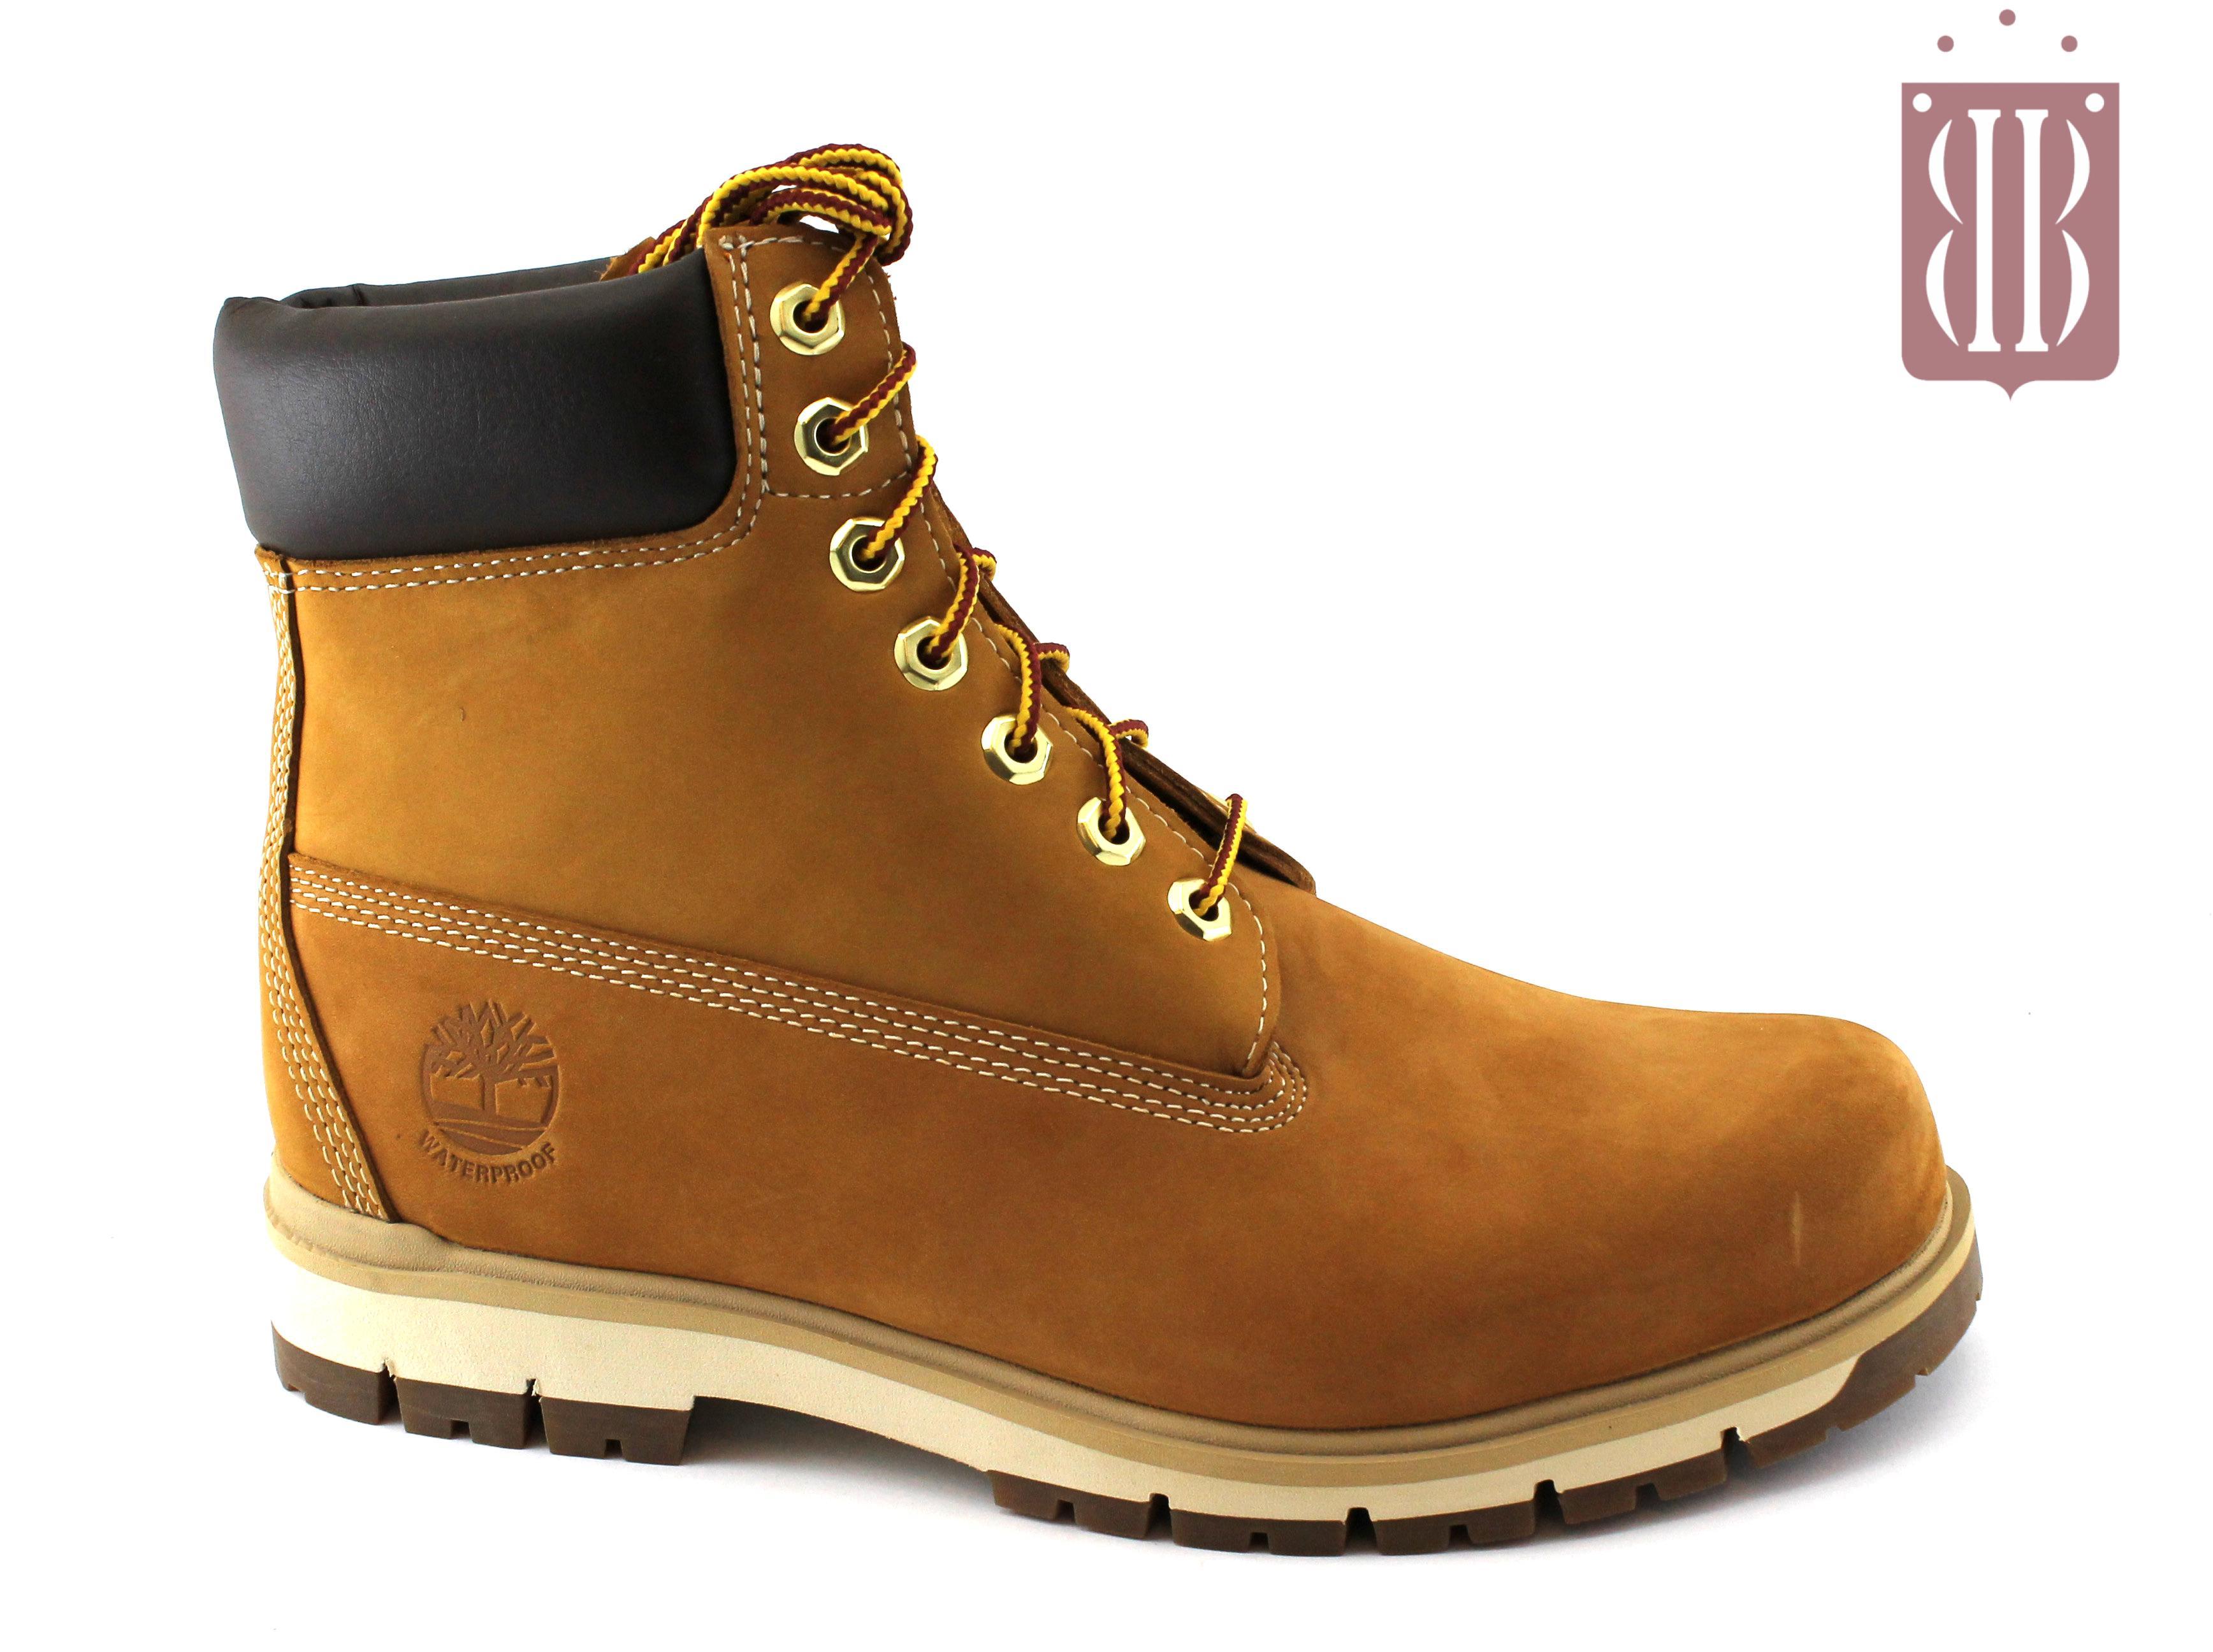 TIMBERLAND A1JHF wheat giallo scarpe uomo scarponcini mid lacci